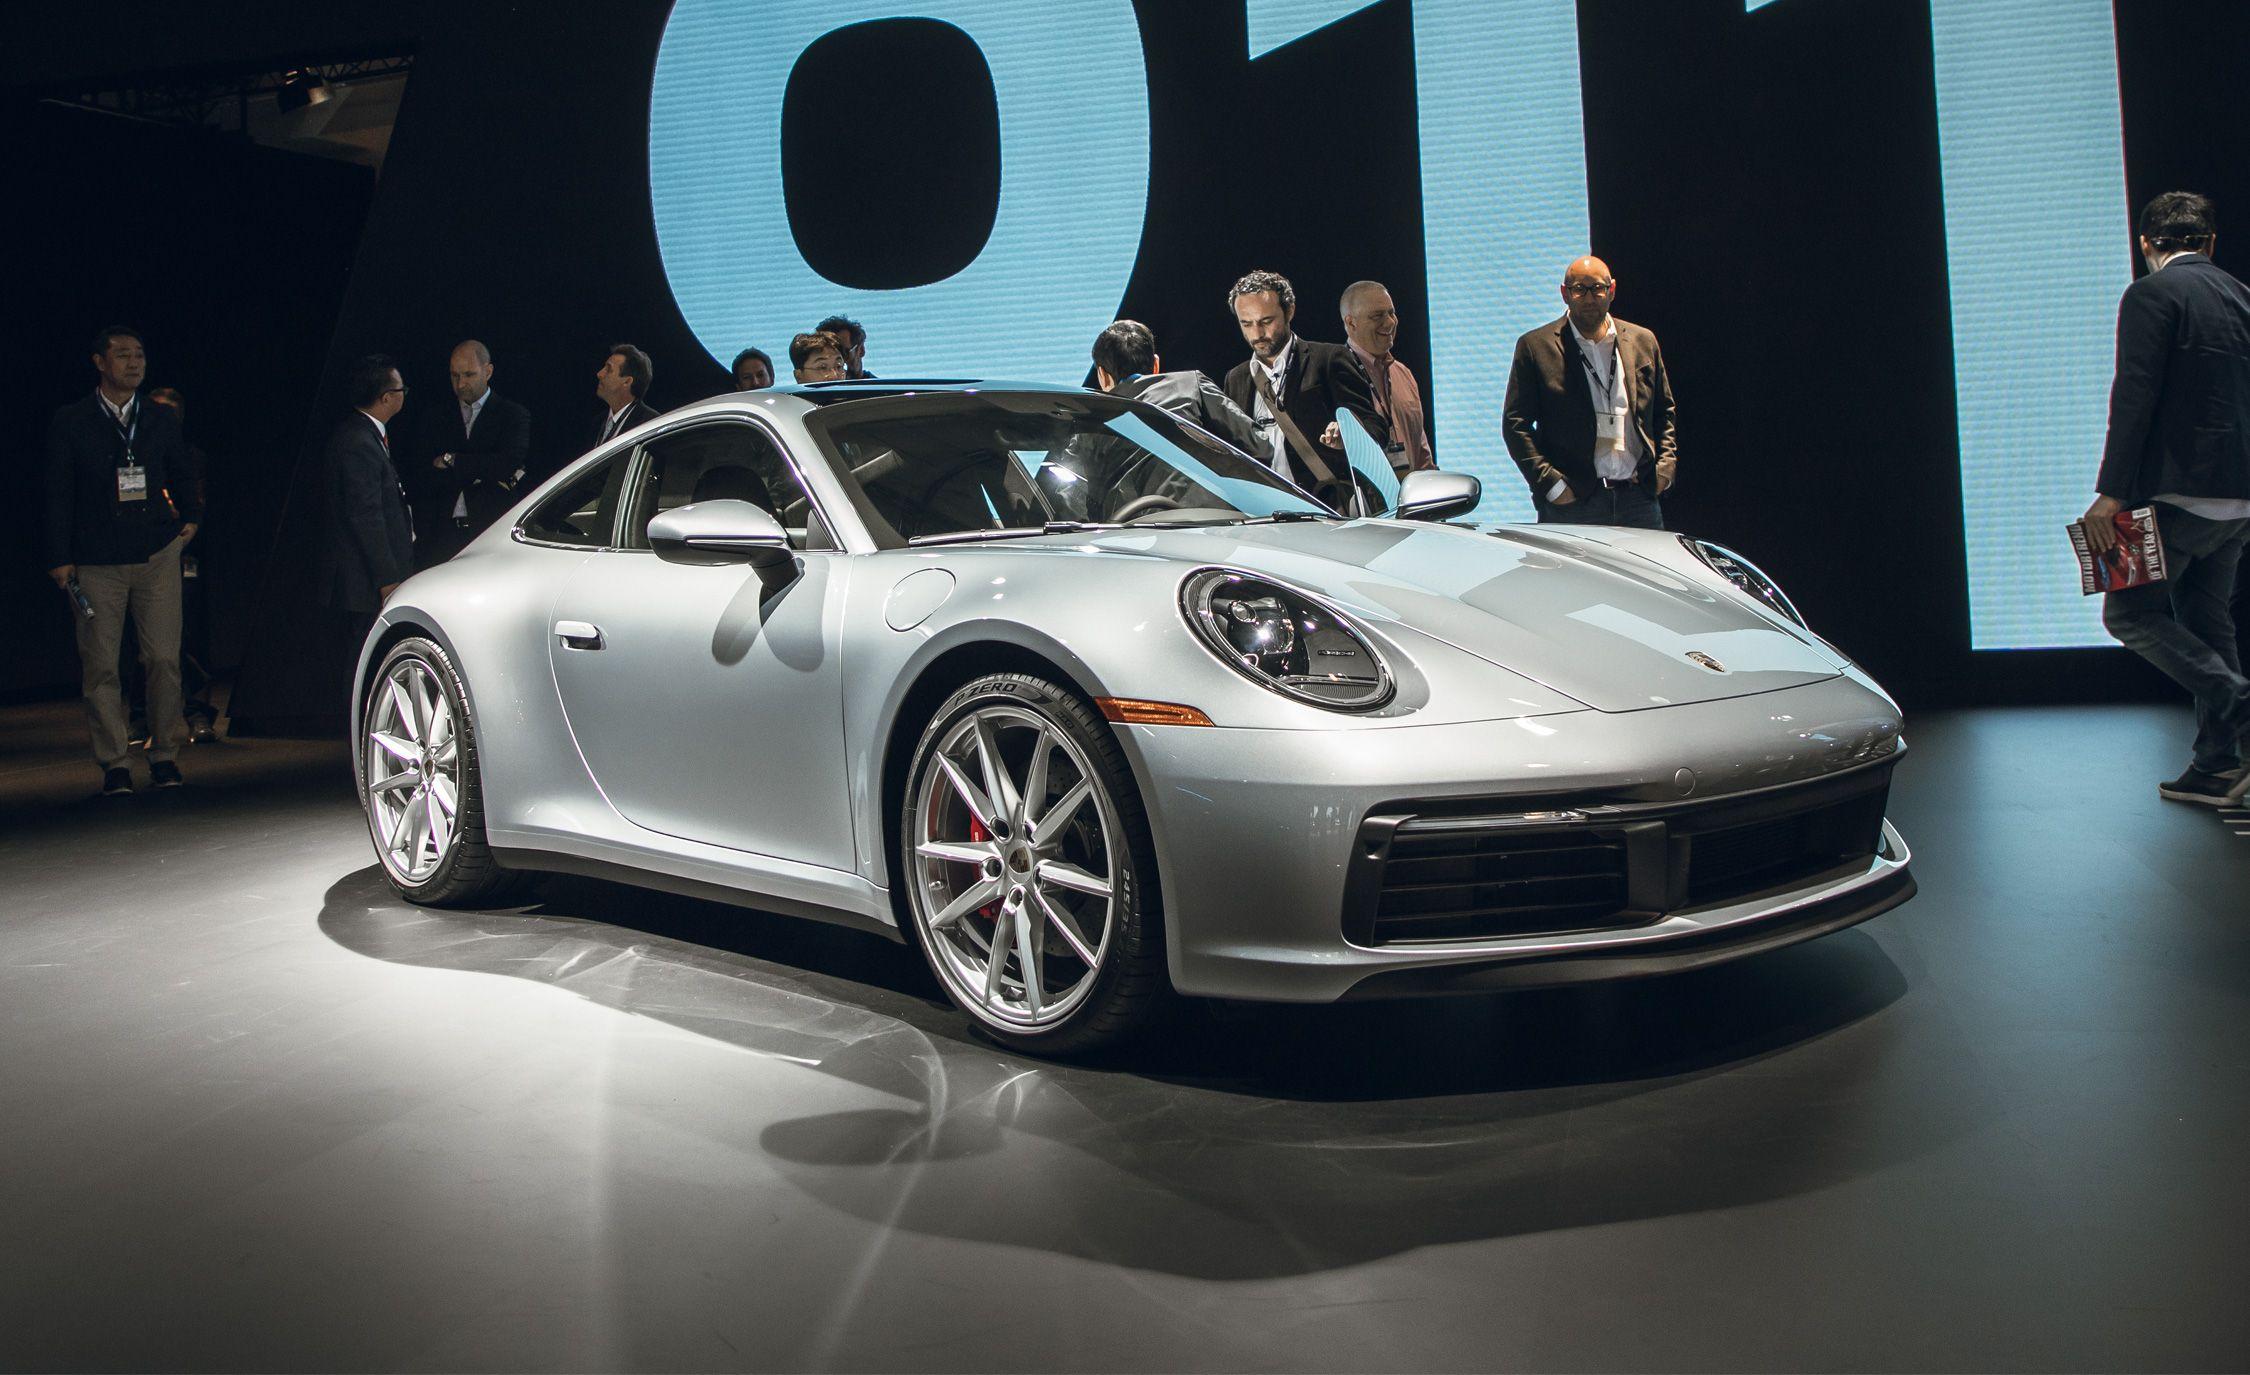 2020 Porsche 911 992 Generation Sports Car